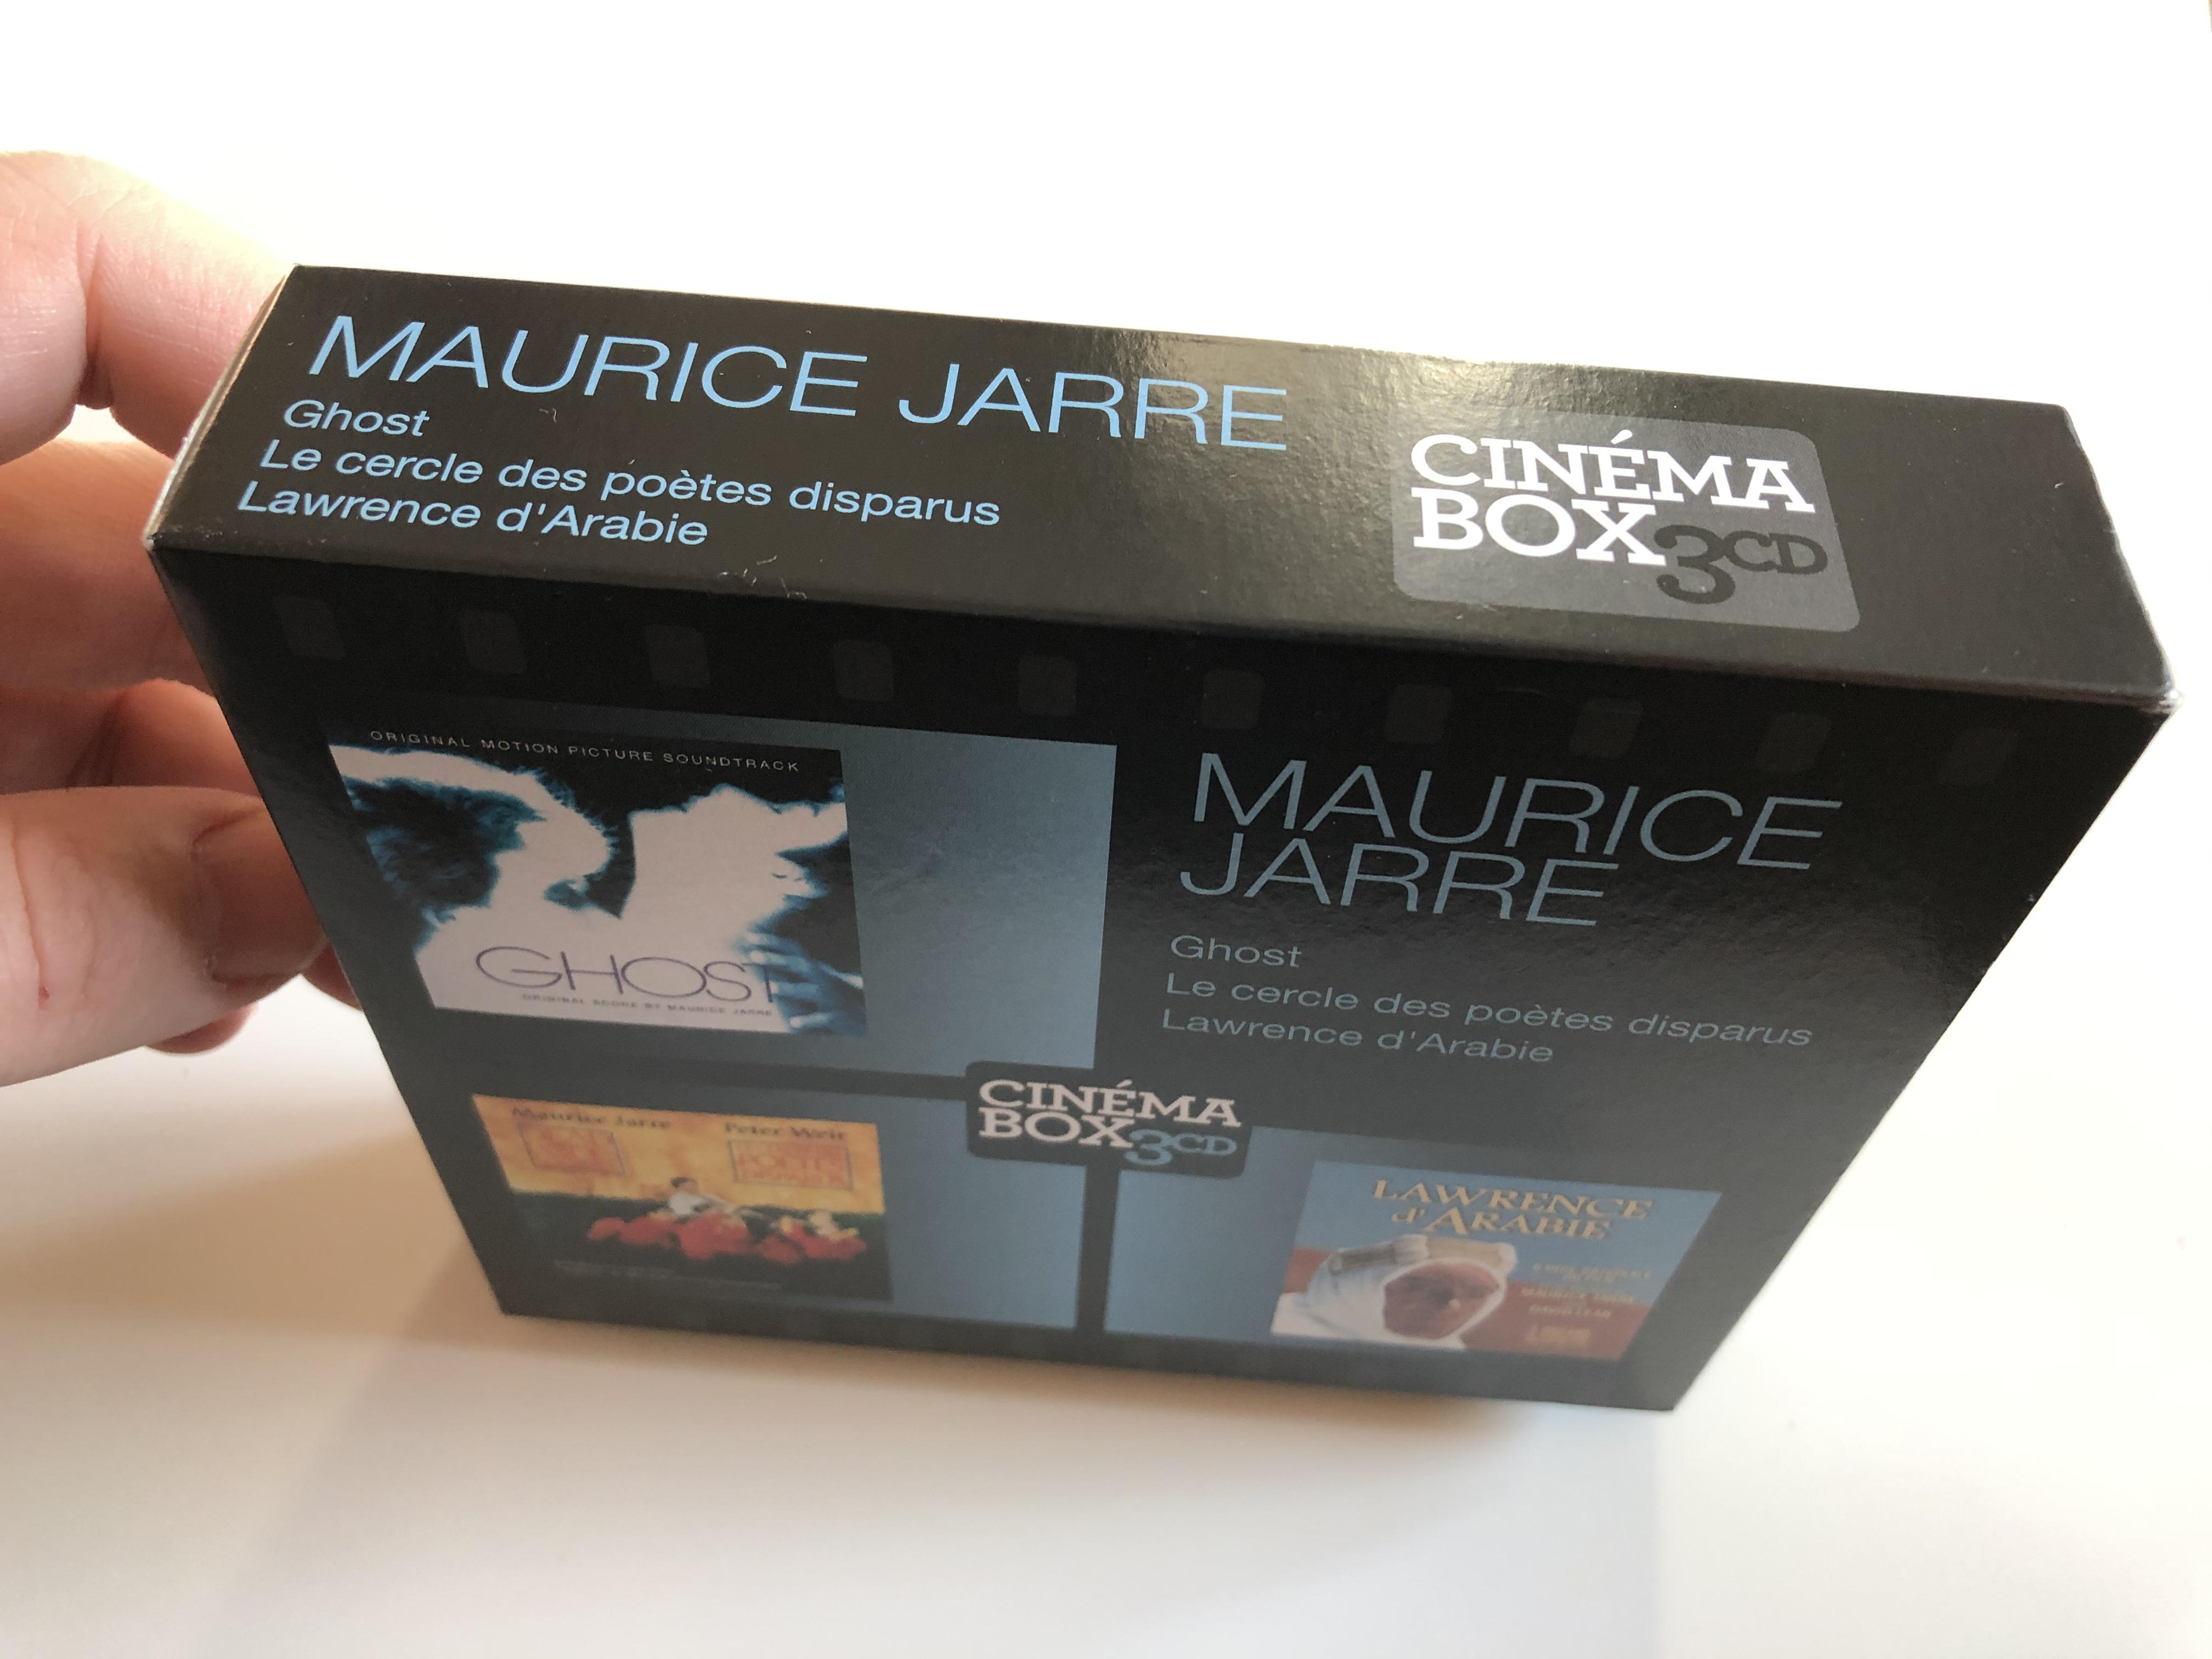 maurice-jarre-ghost-le-cercle-des-poetes-disparus-lawrence-d-arabie-cinema-box-3x-milan-audio-cd-2013-3995102-3-.jpg